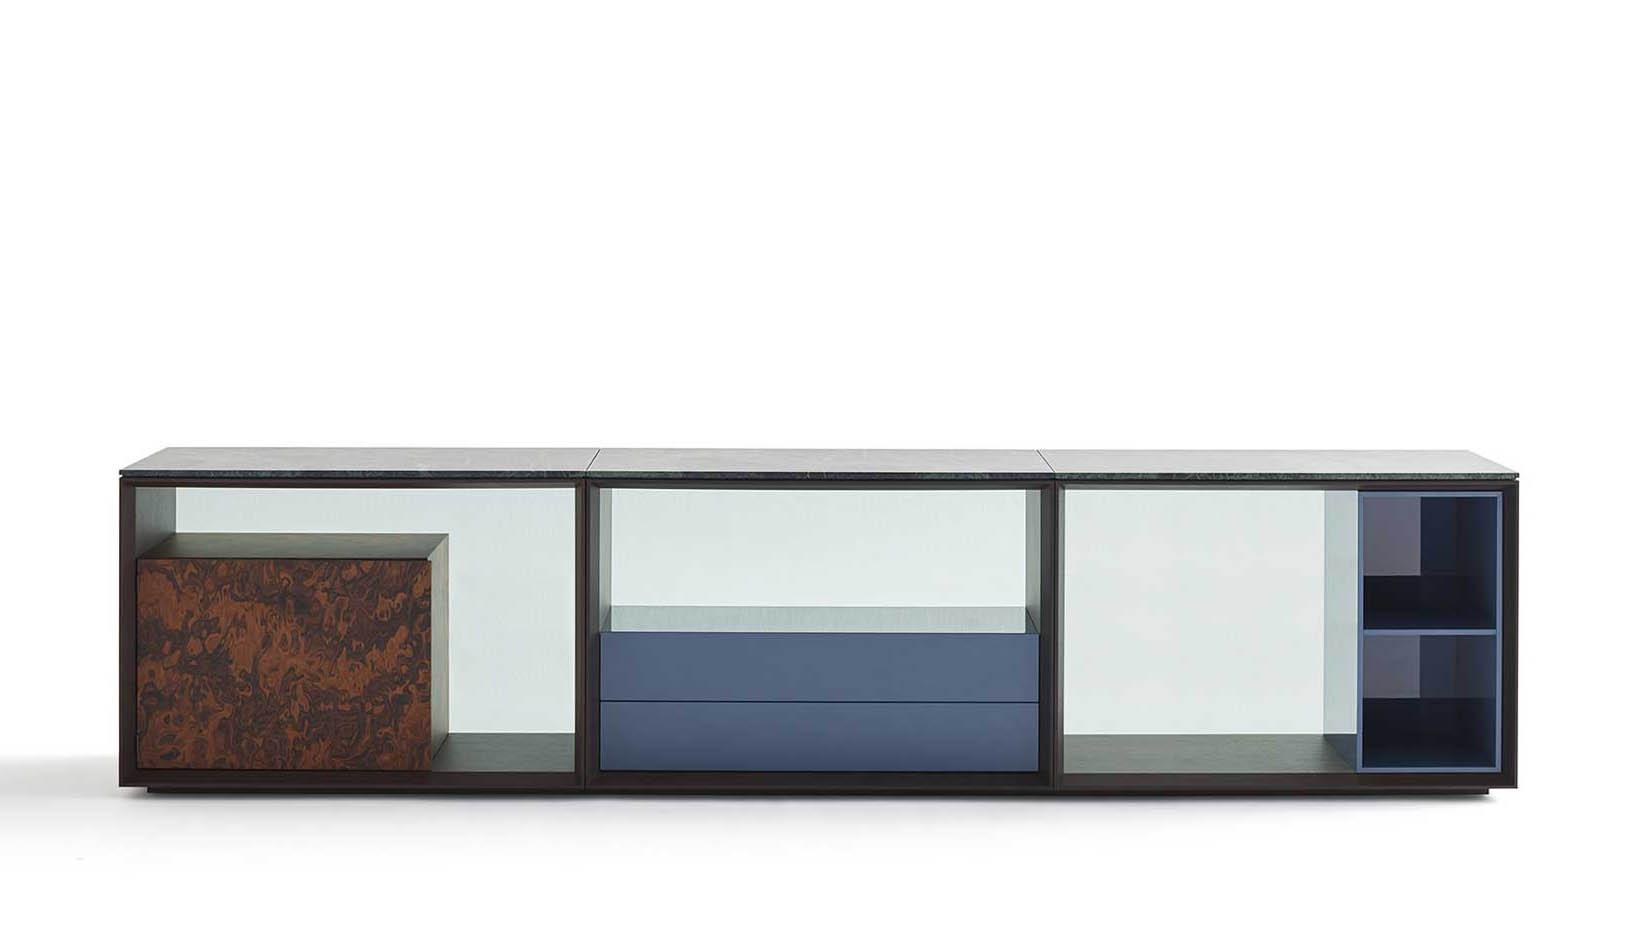 Matrioska by Piero Lissoni for Knoll at Salone del Mobile 2017 | Yellowtrace